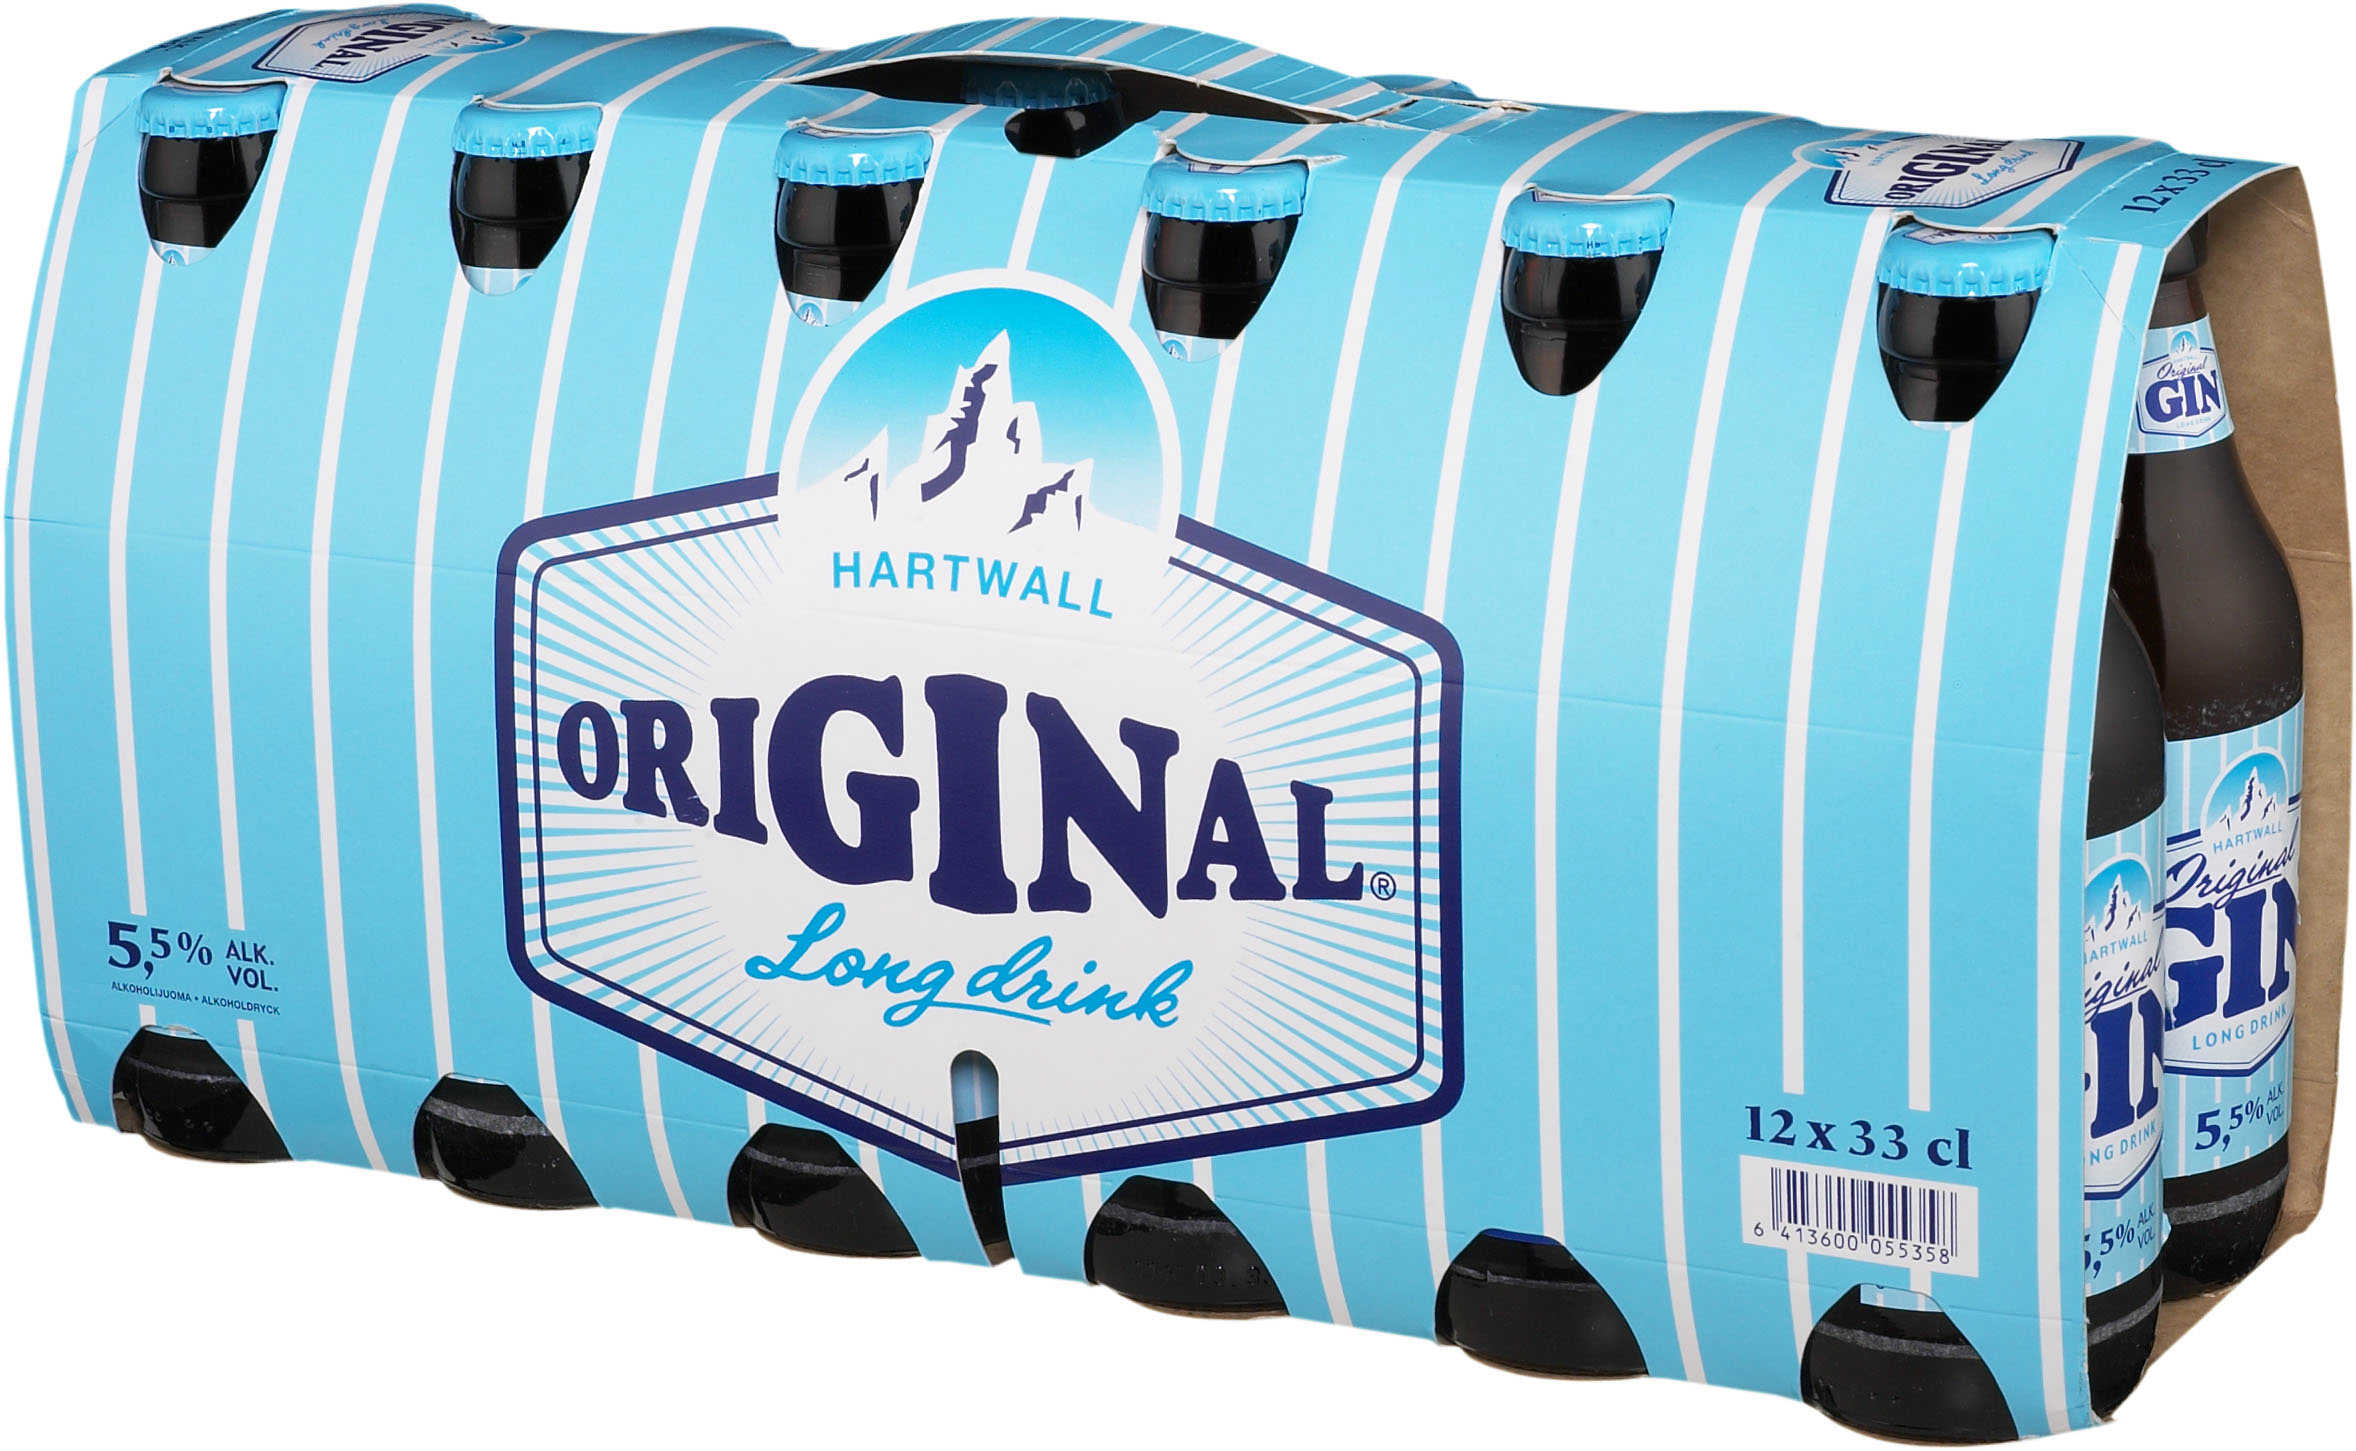 Original Long Drink 24 Pack Hinta Alko